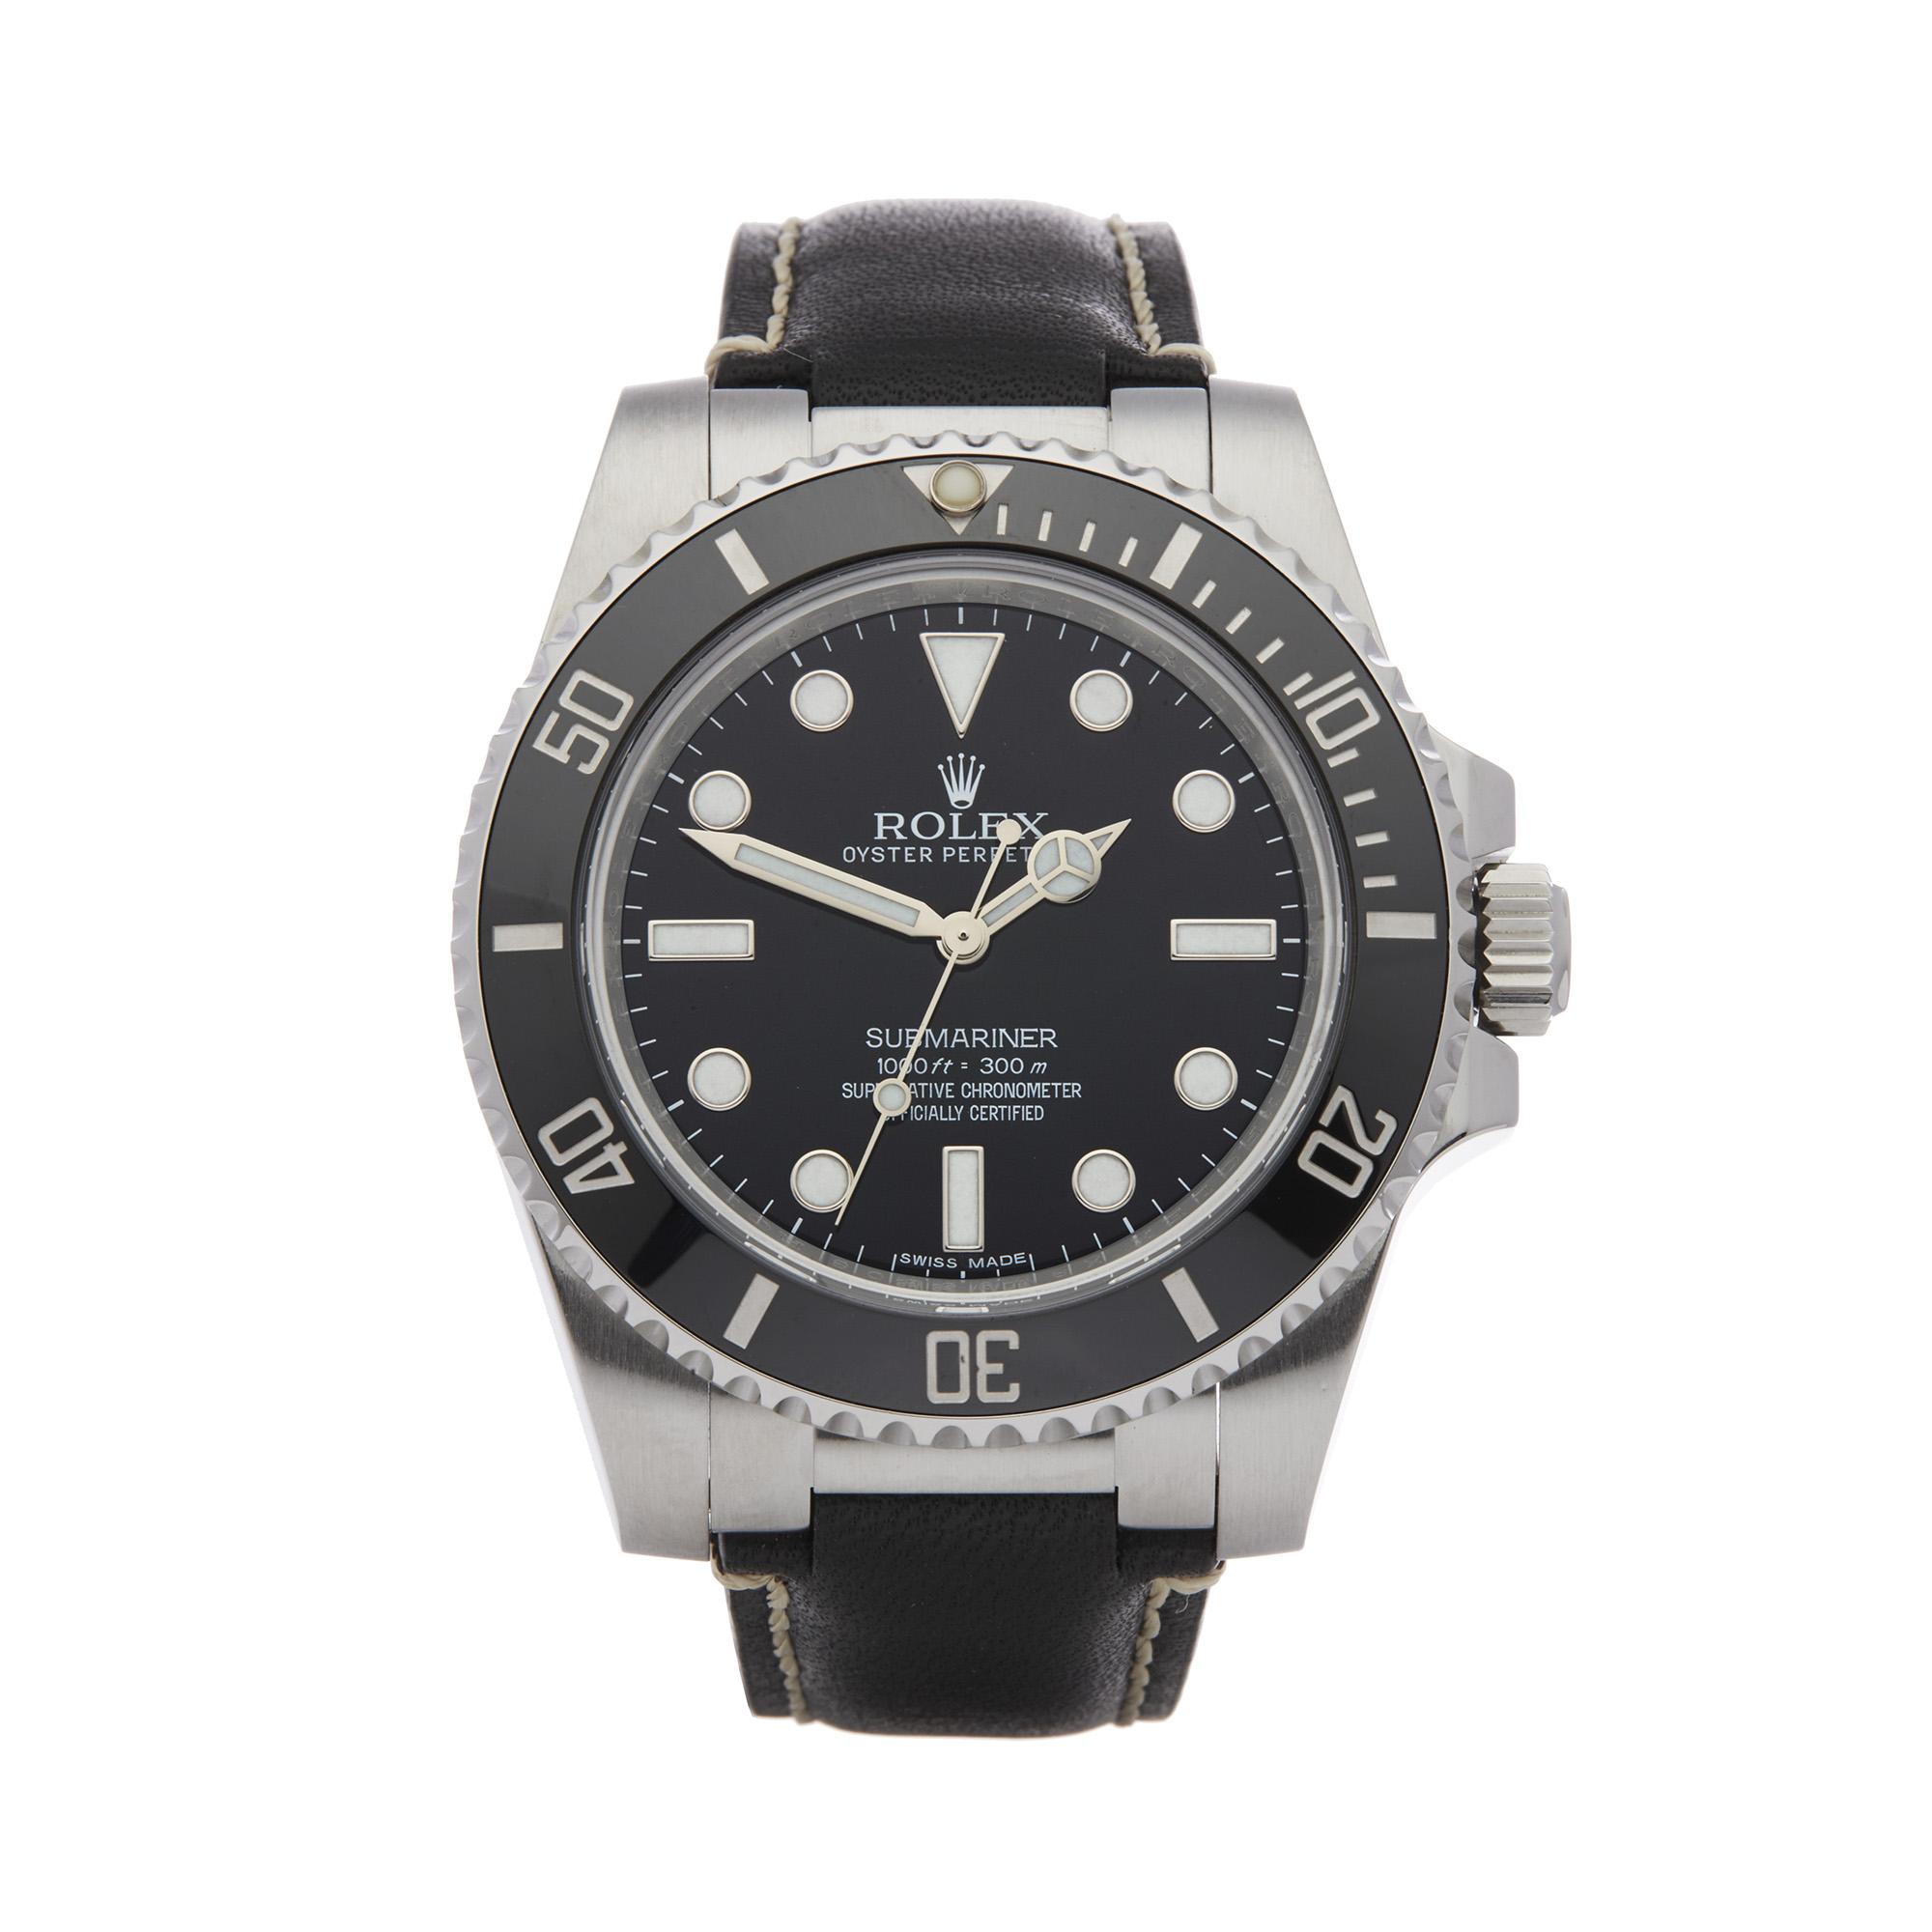 Rolex Submariner No Date 114060 Men Stainless Steel Watch - Image 8 of 8